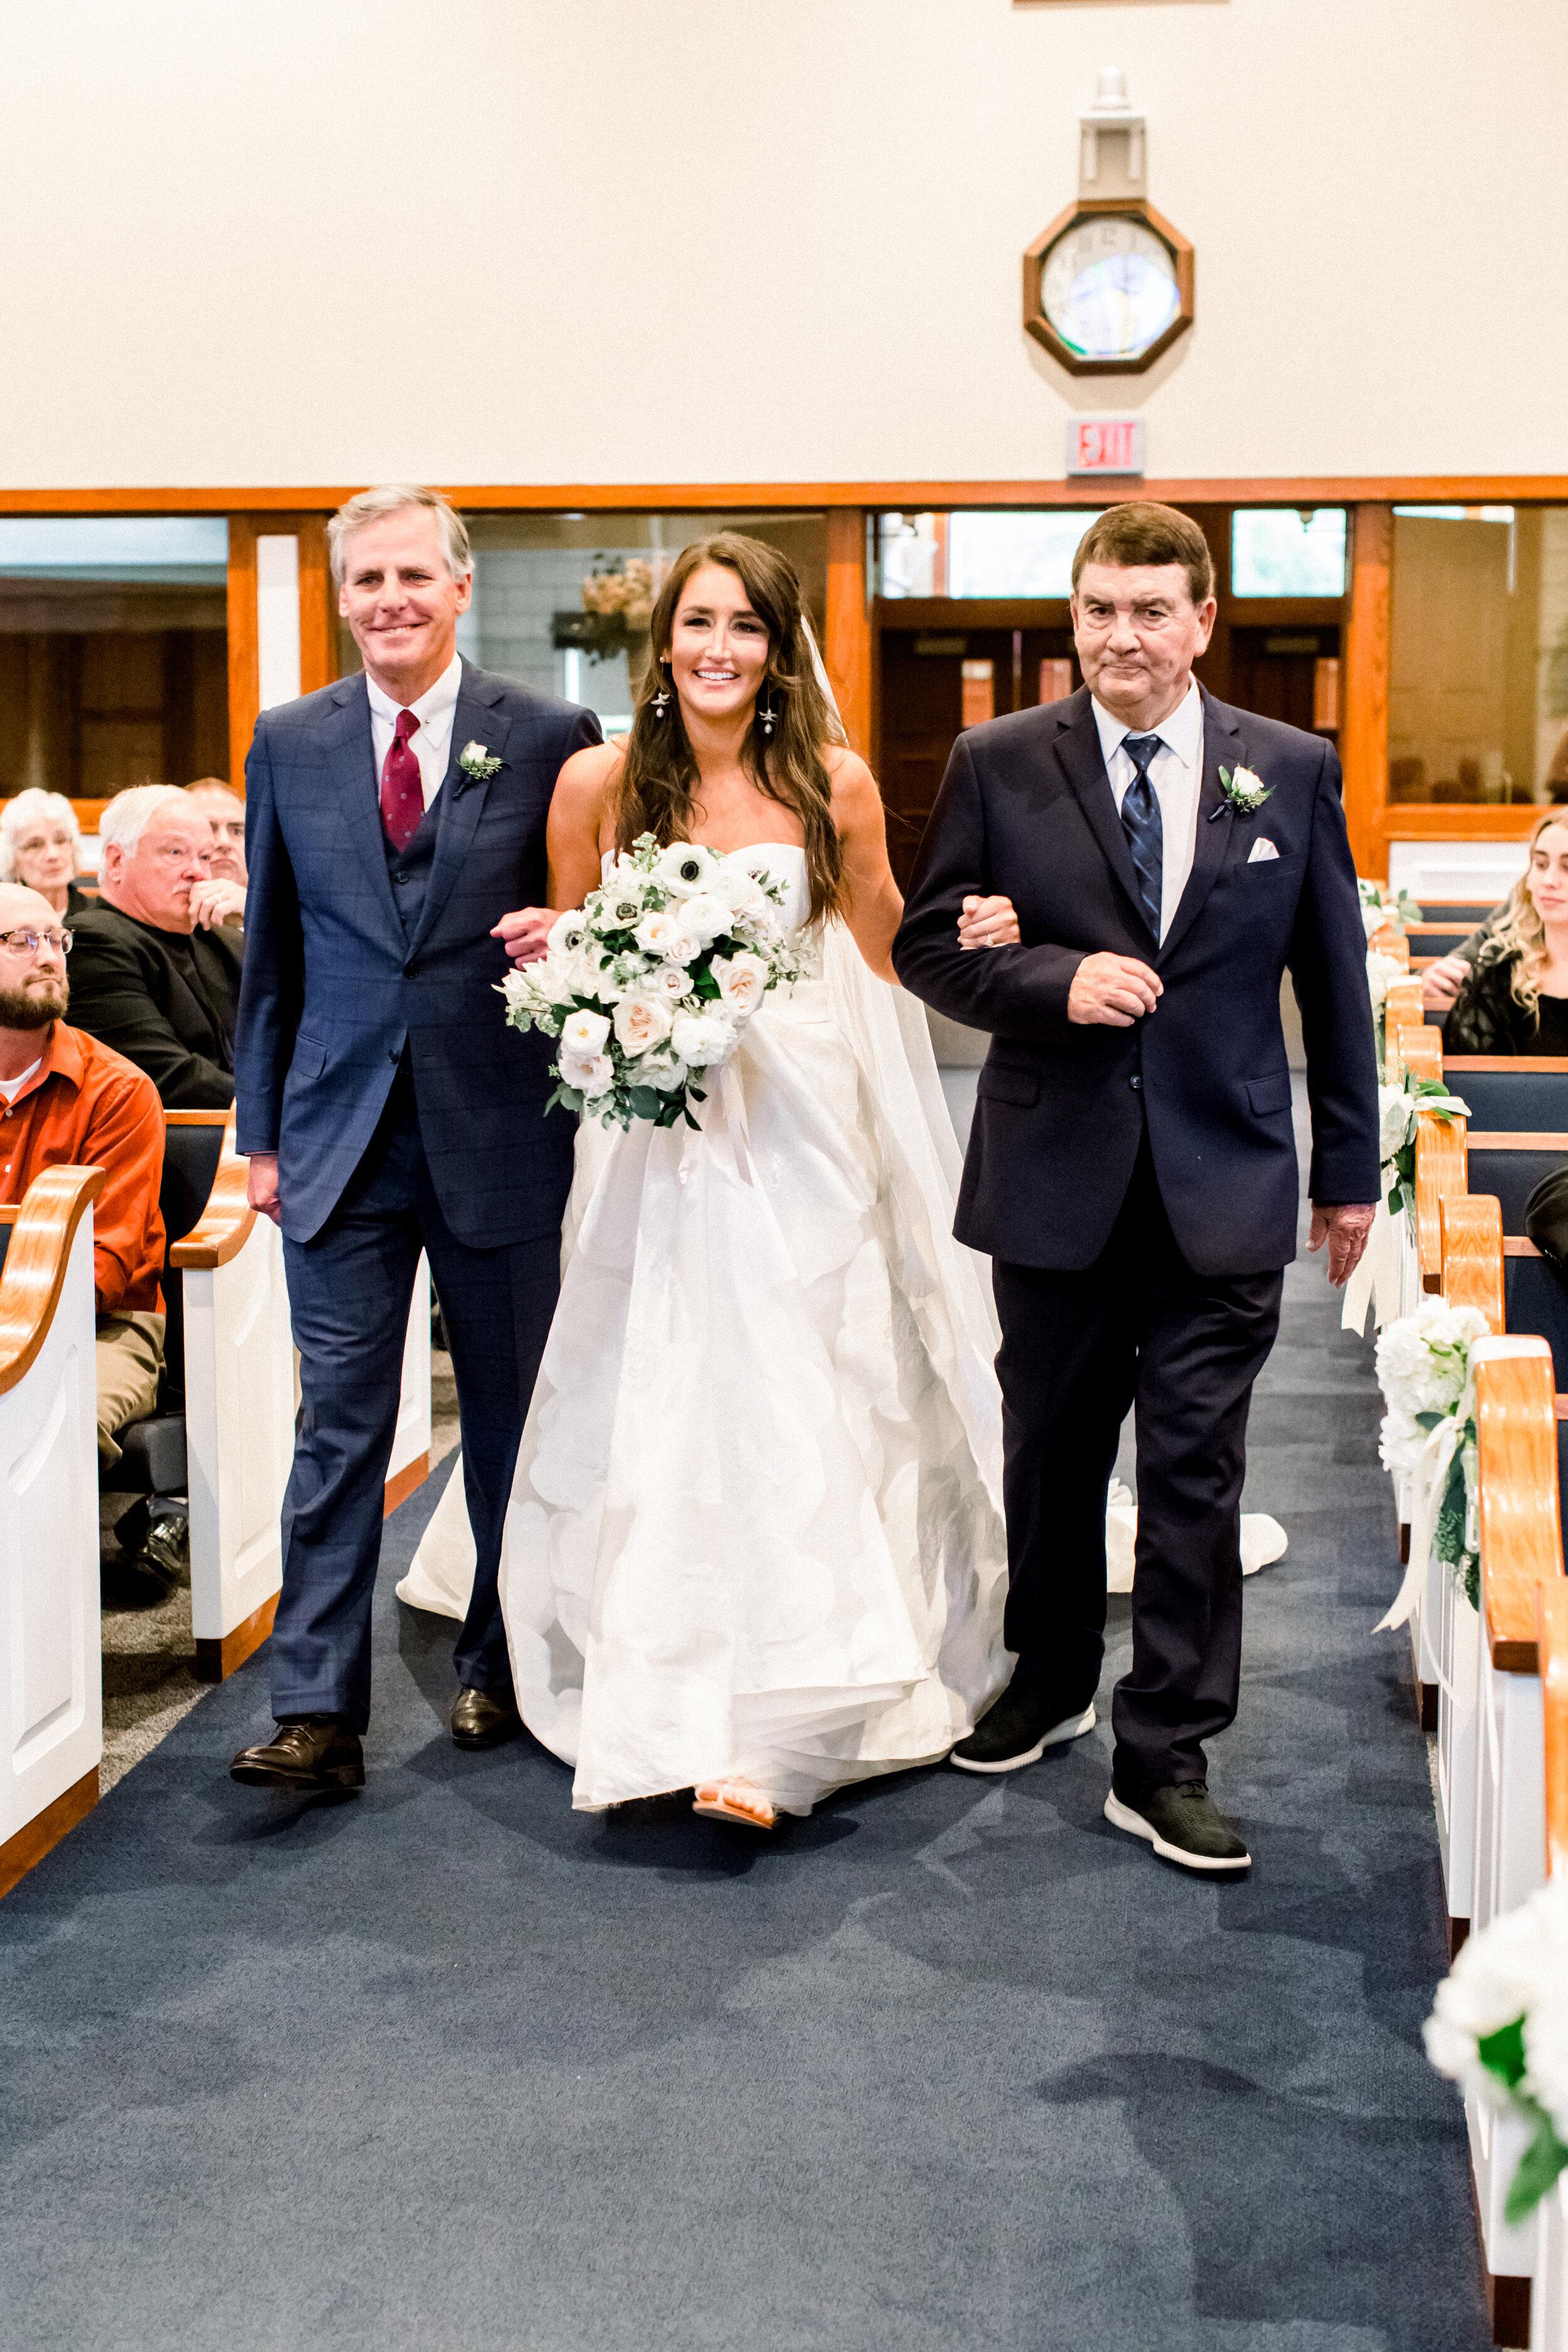 Kuiper+Wedding+Ceremony-125.jpg